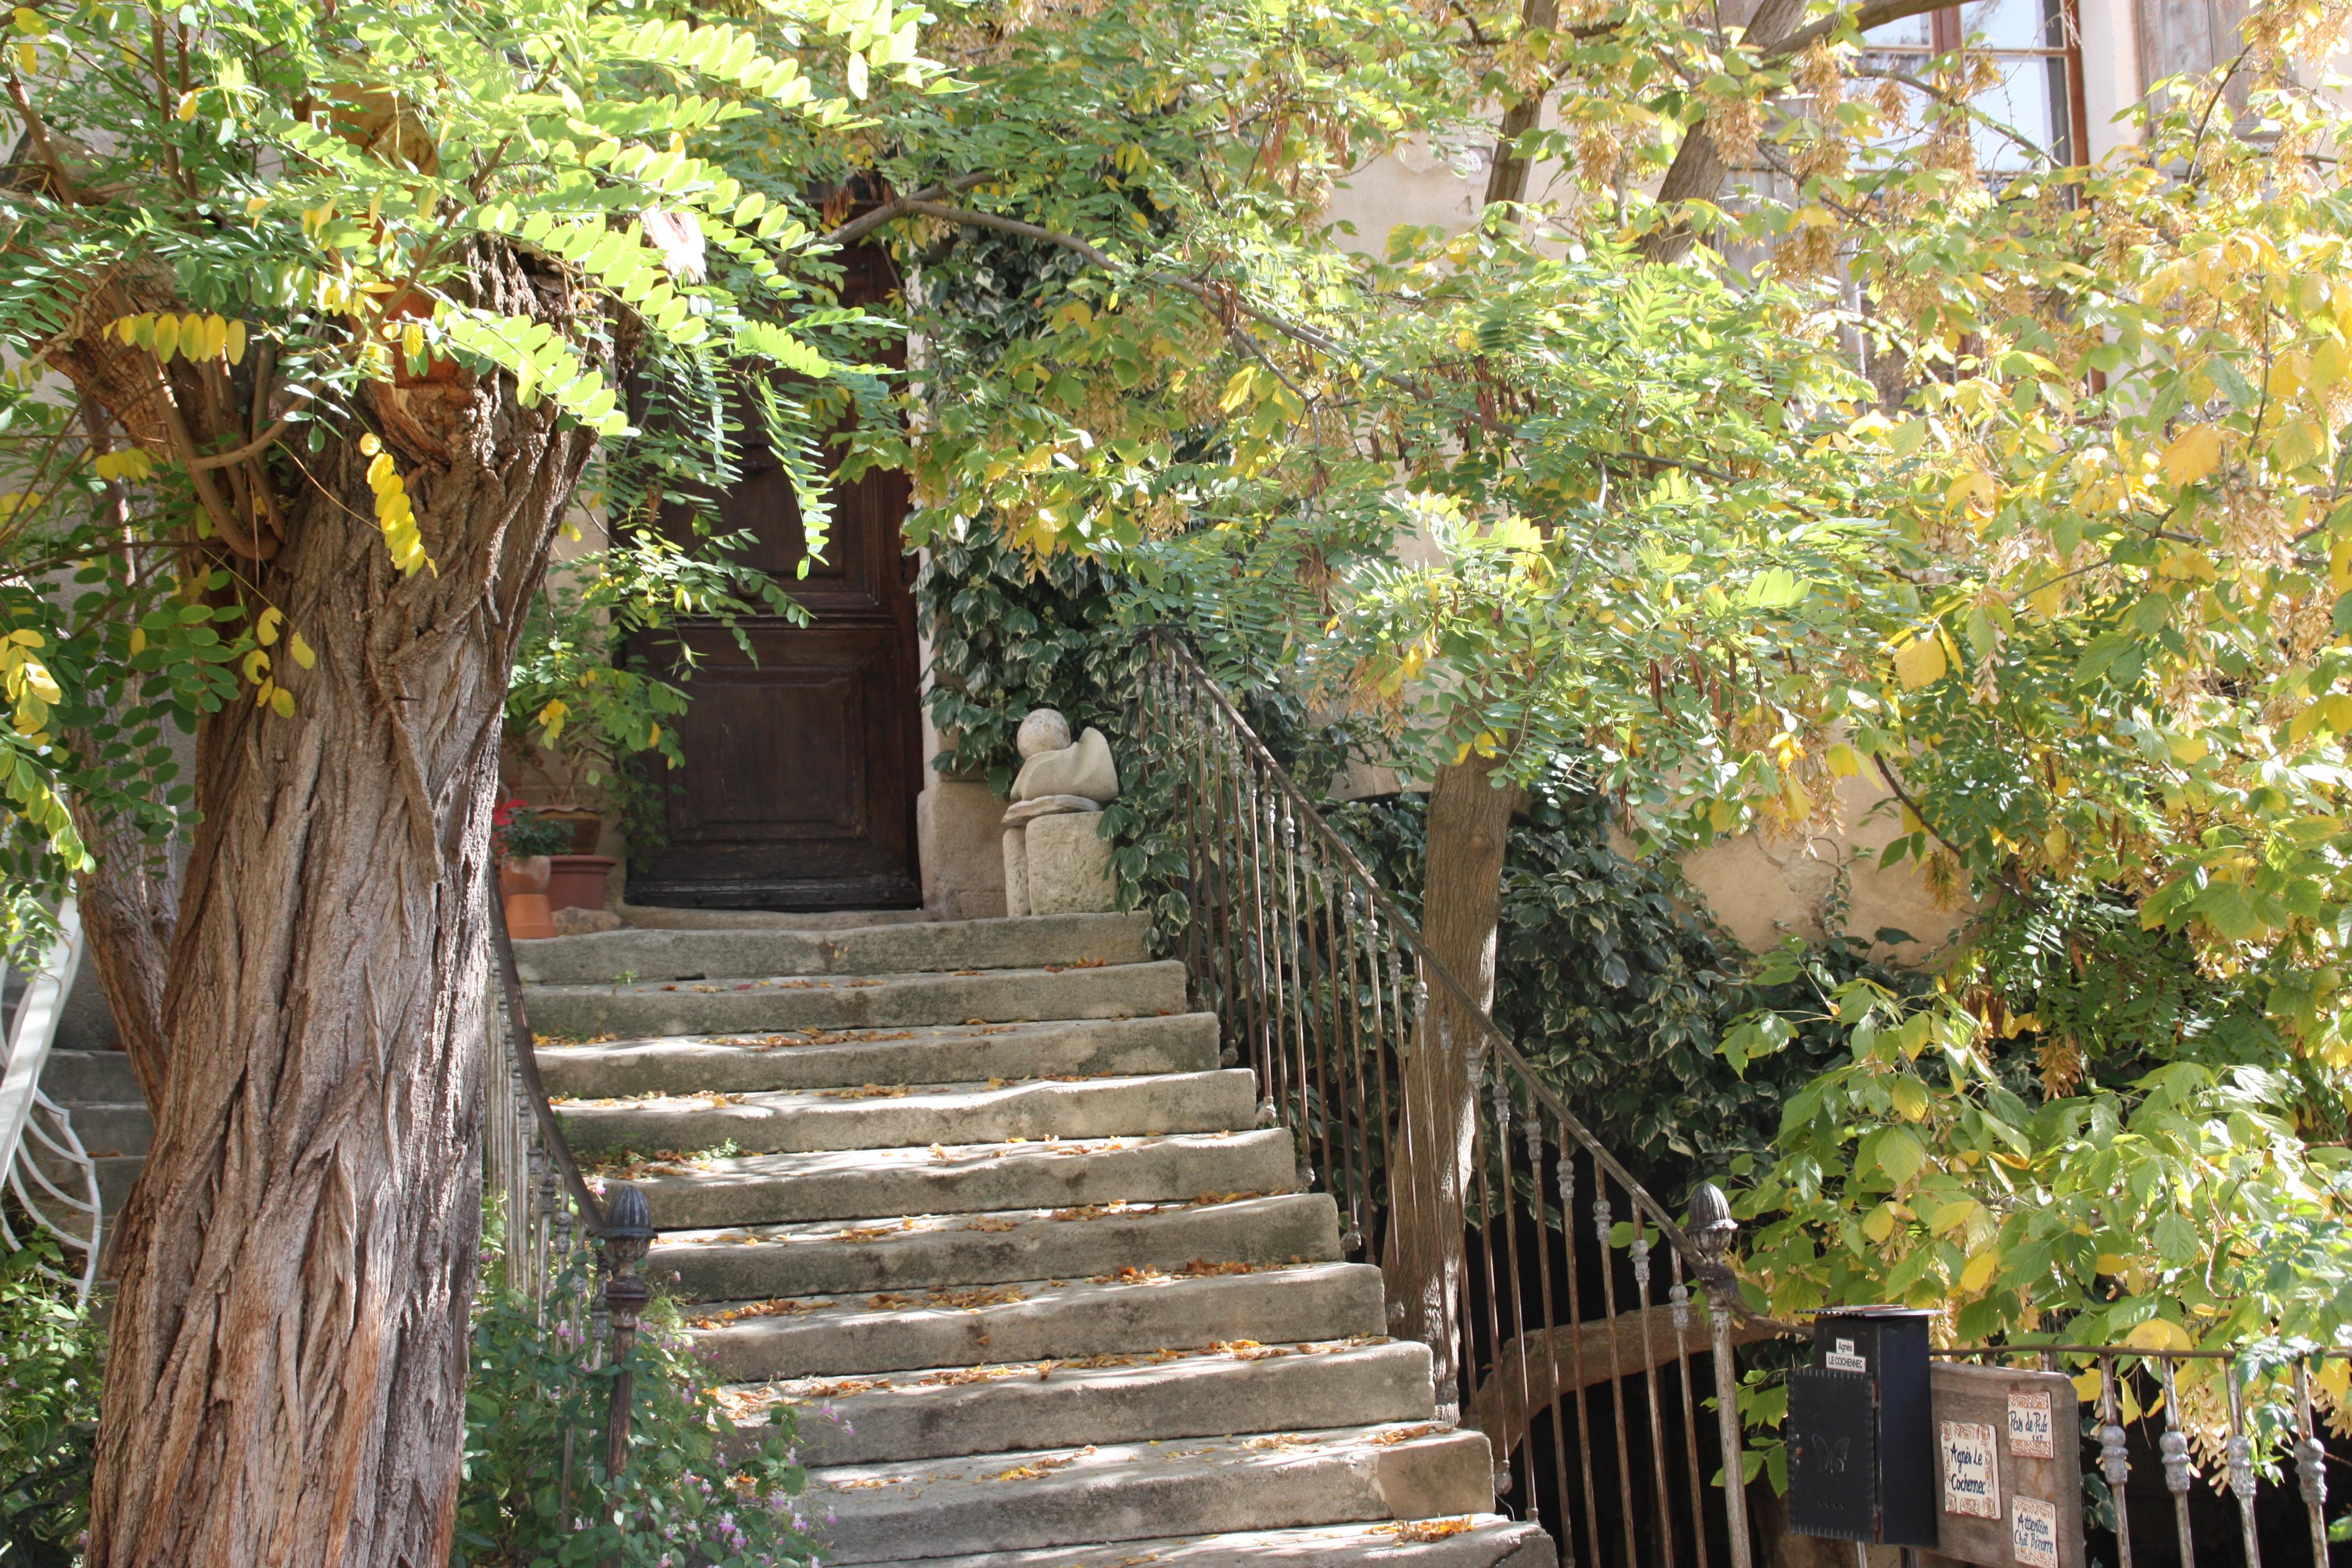 Vacances en Provence, vacances en Lu